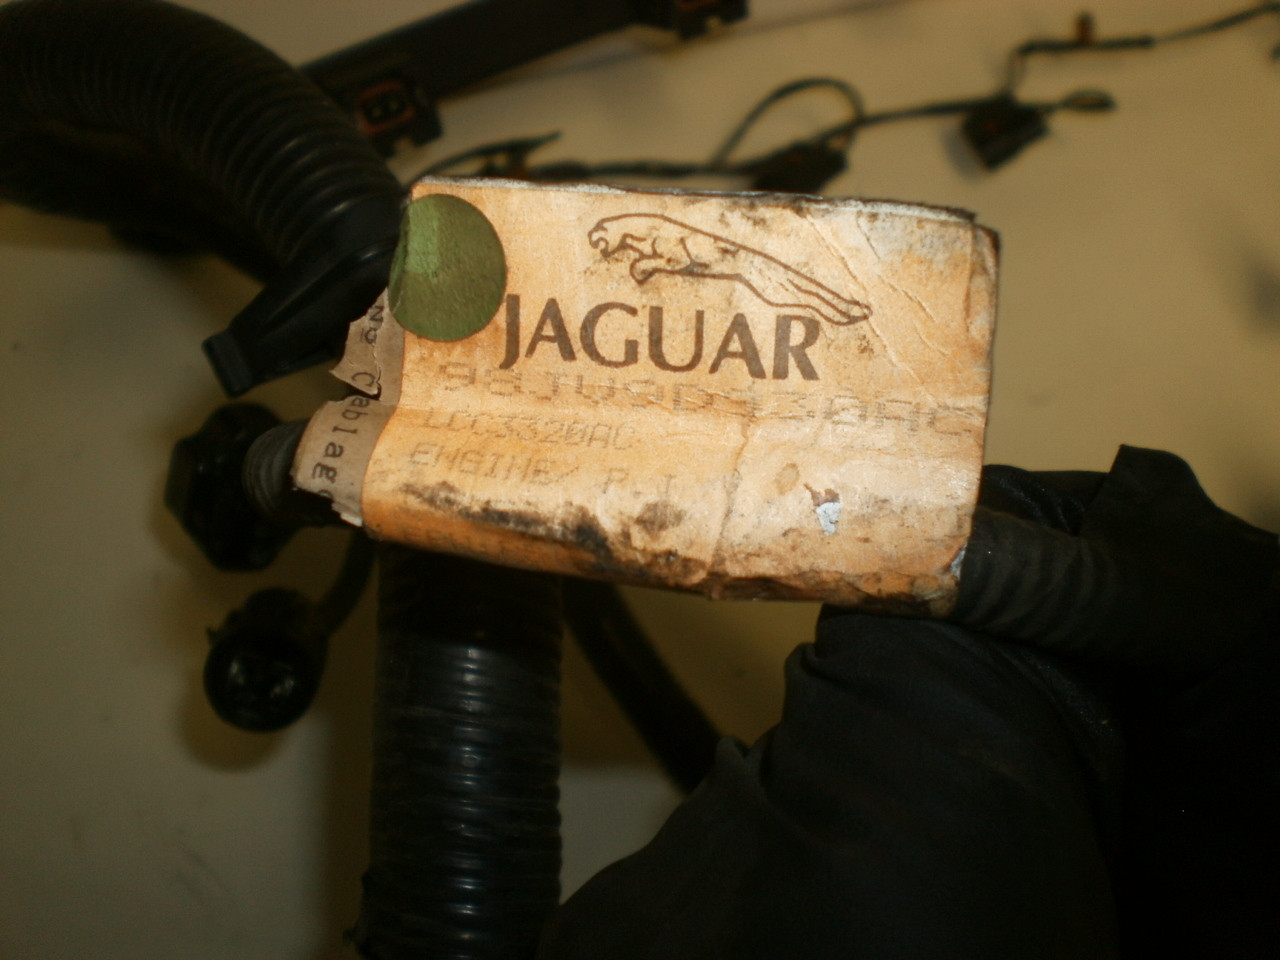 1998 2002 Jaguar Xj8 Vanden Plas Drivers Steering Wheel Air Bag Xj6 Wiring Harness Larger More Photos